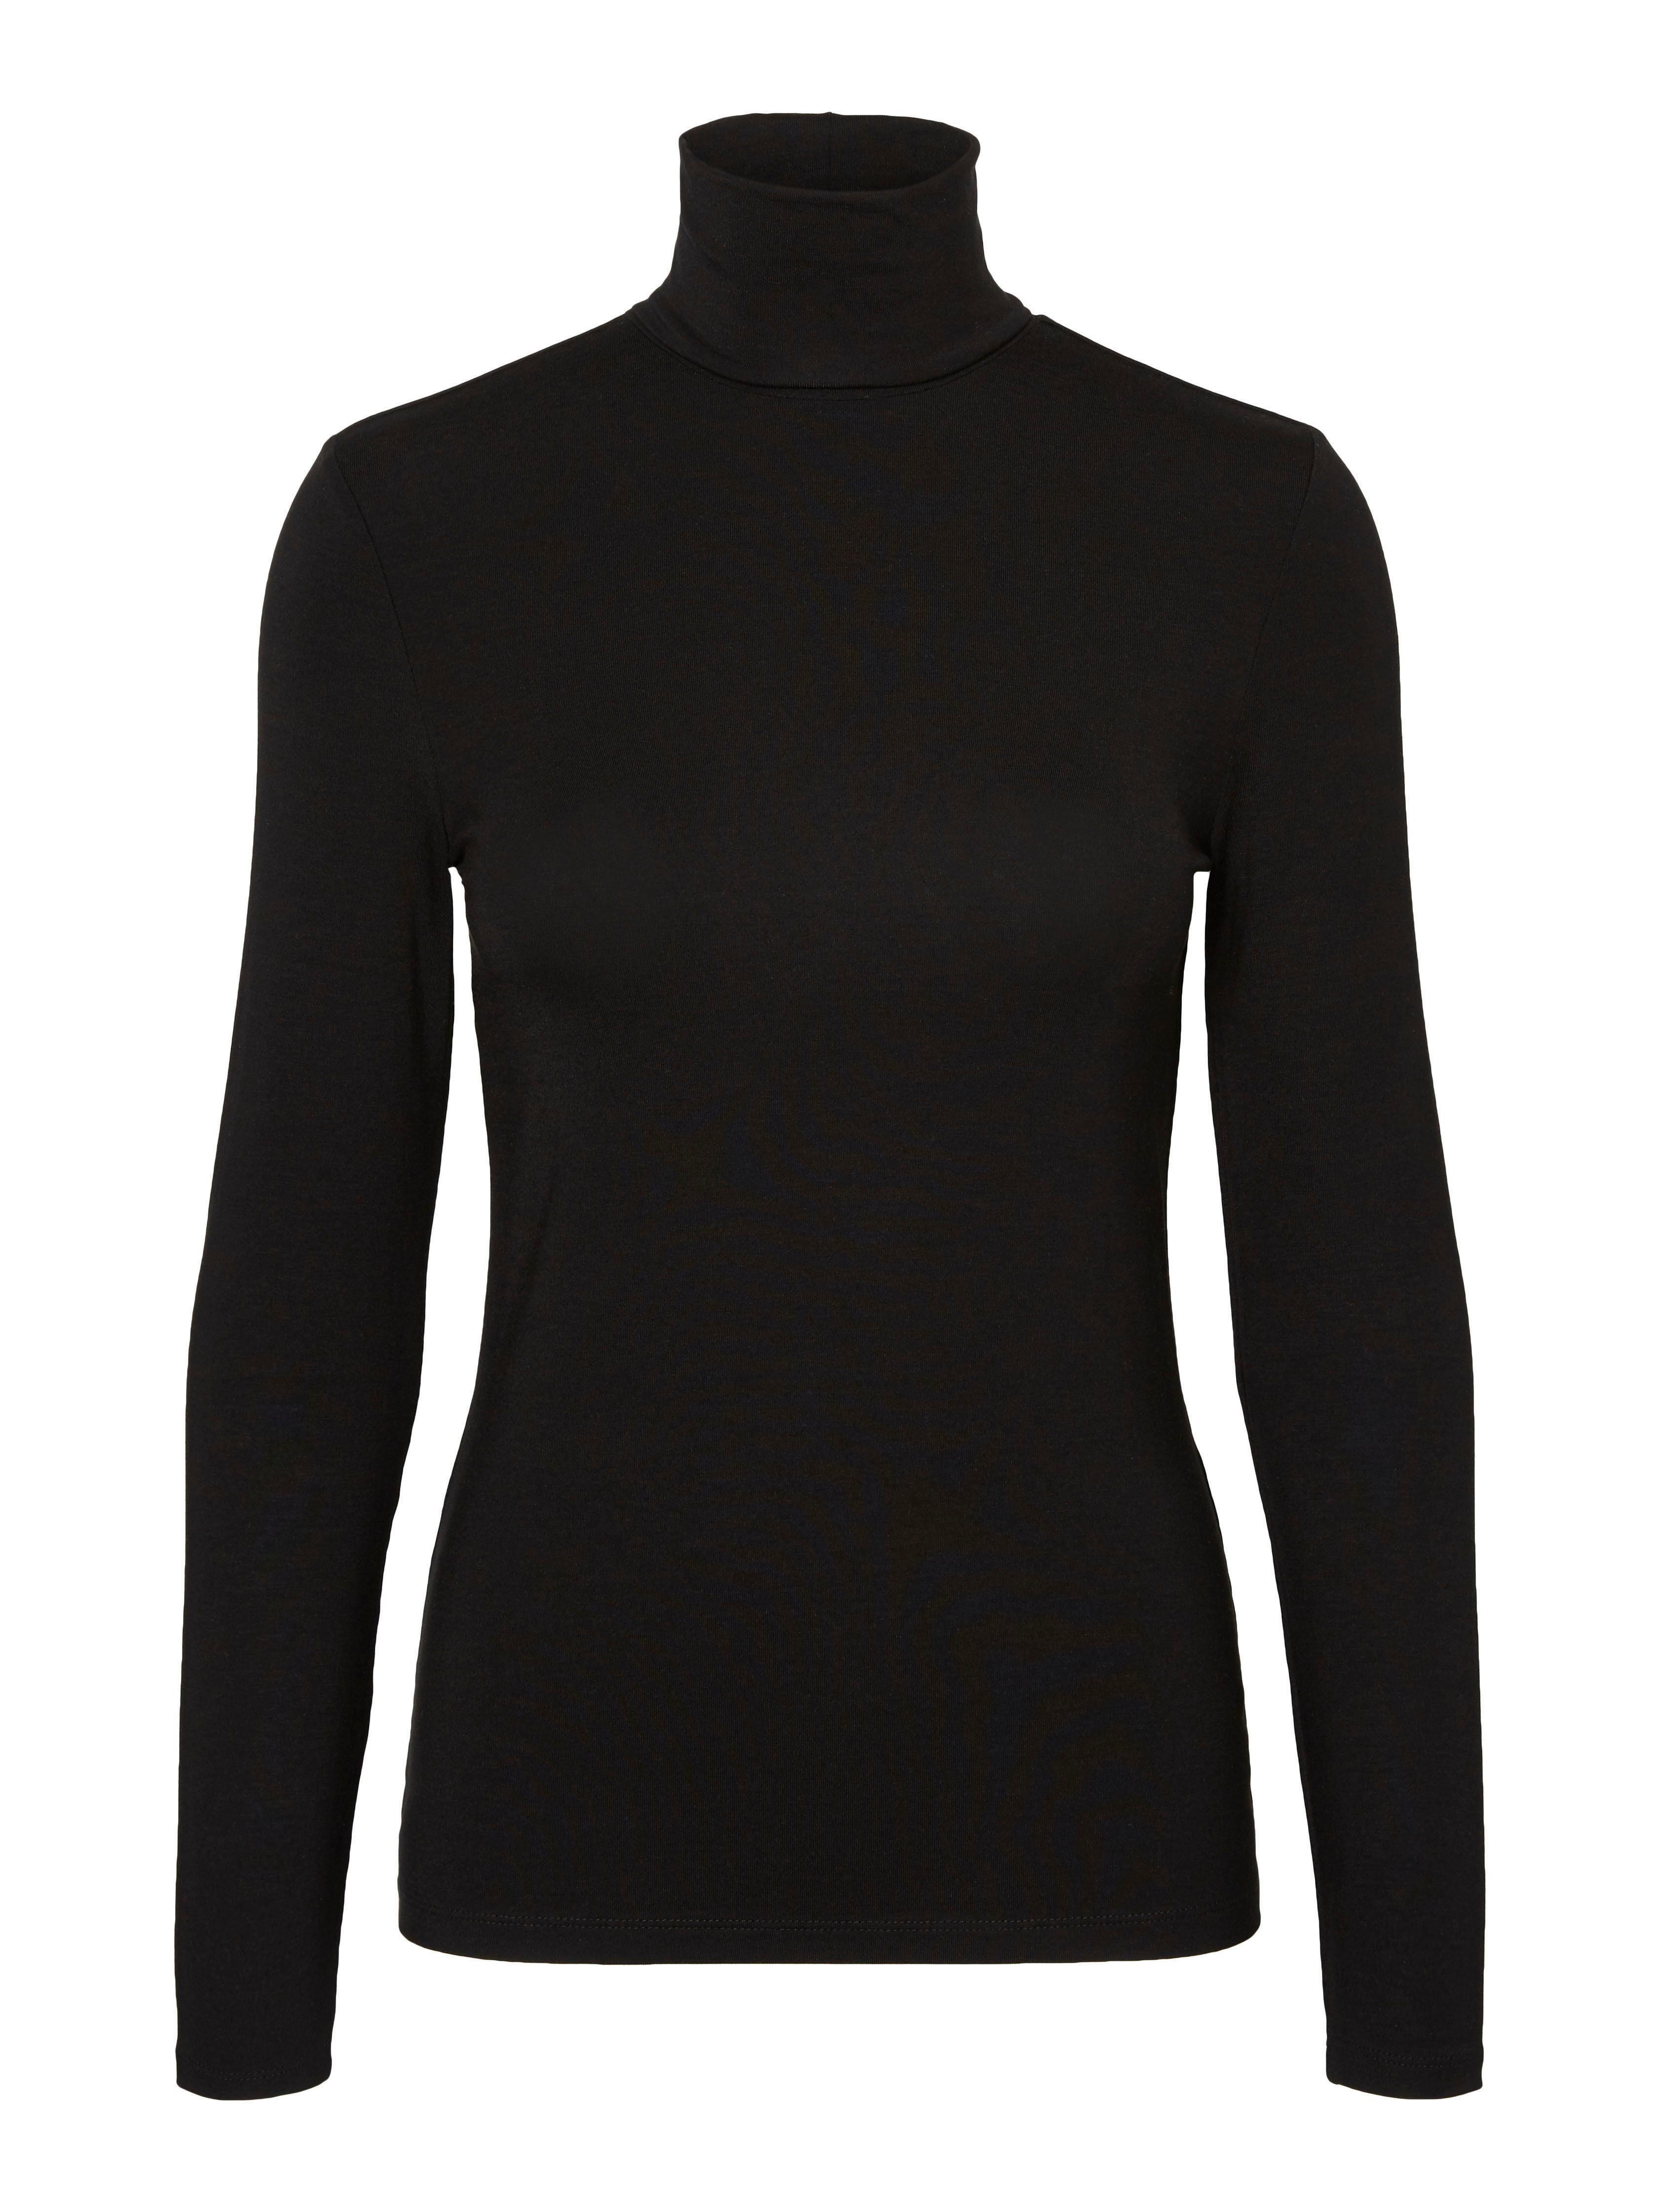 Vero Moda Rollkragenshirt AVA LULU | Bekleidung > Shirts > Rollkragenshirts | Vero Moda